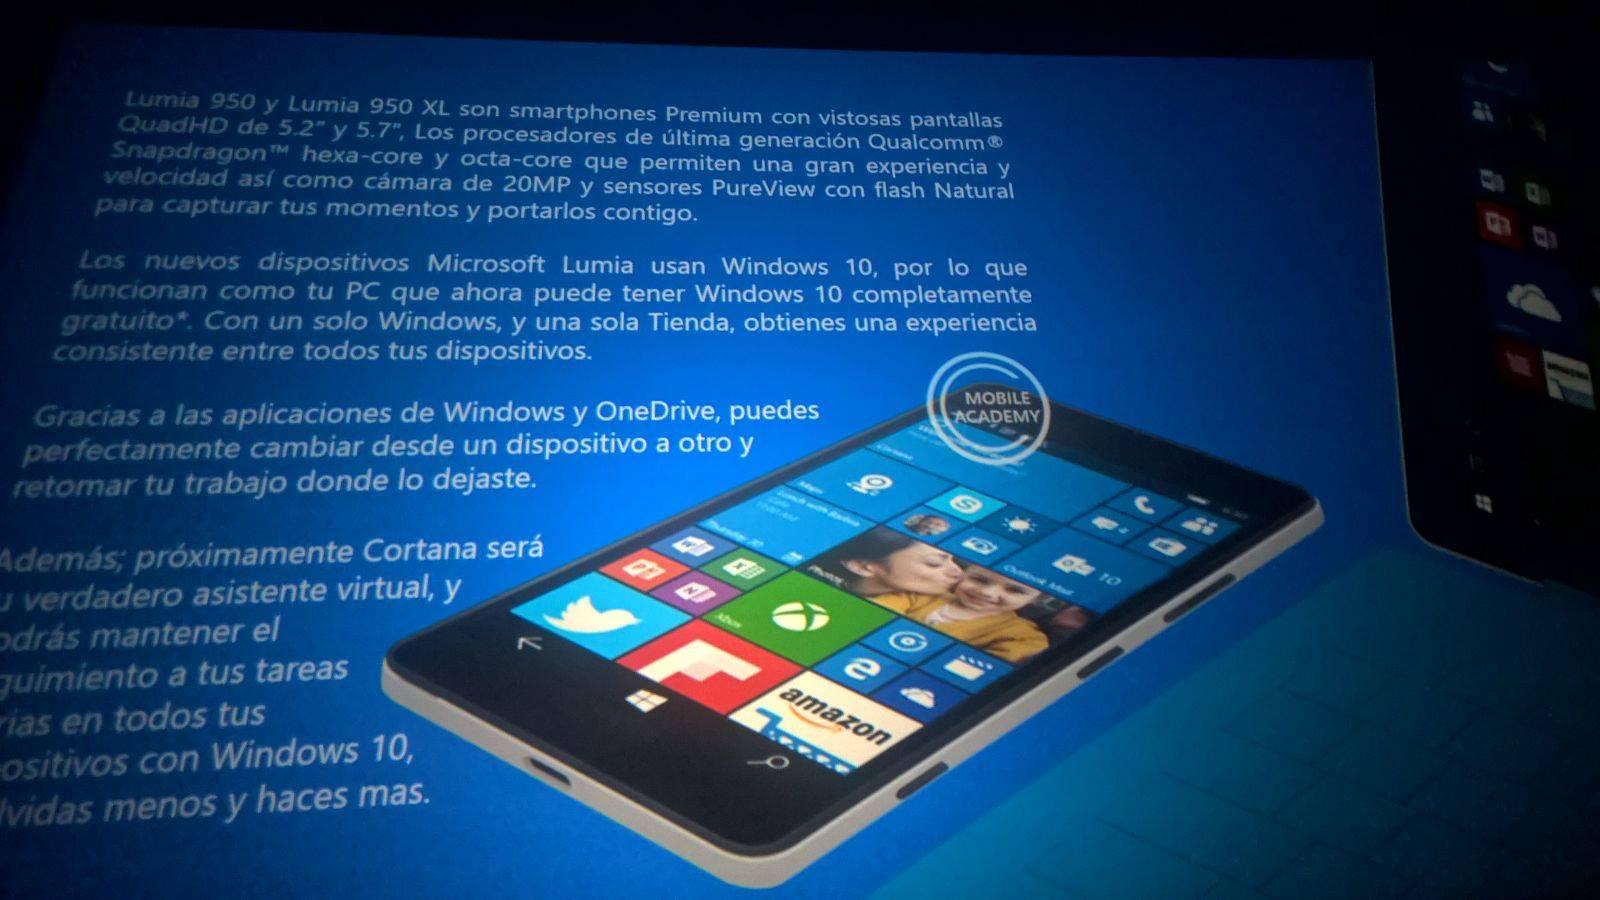 Lumia 950/950XL information